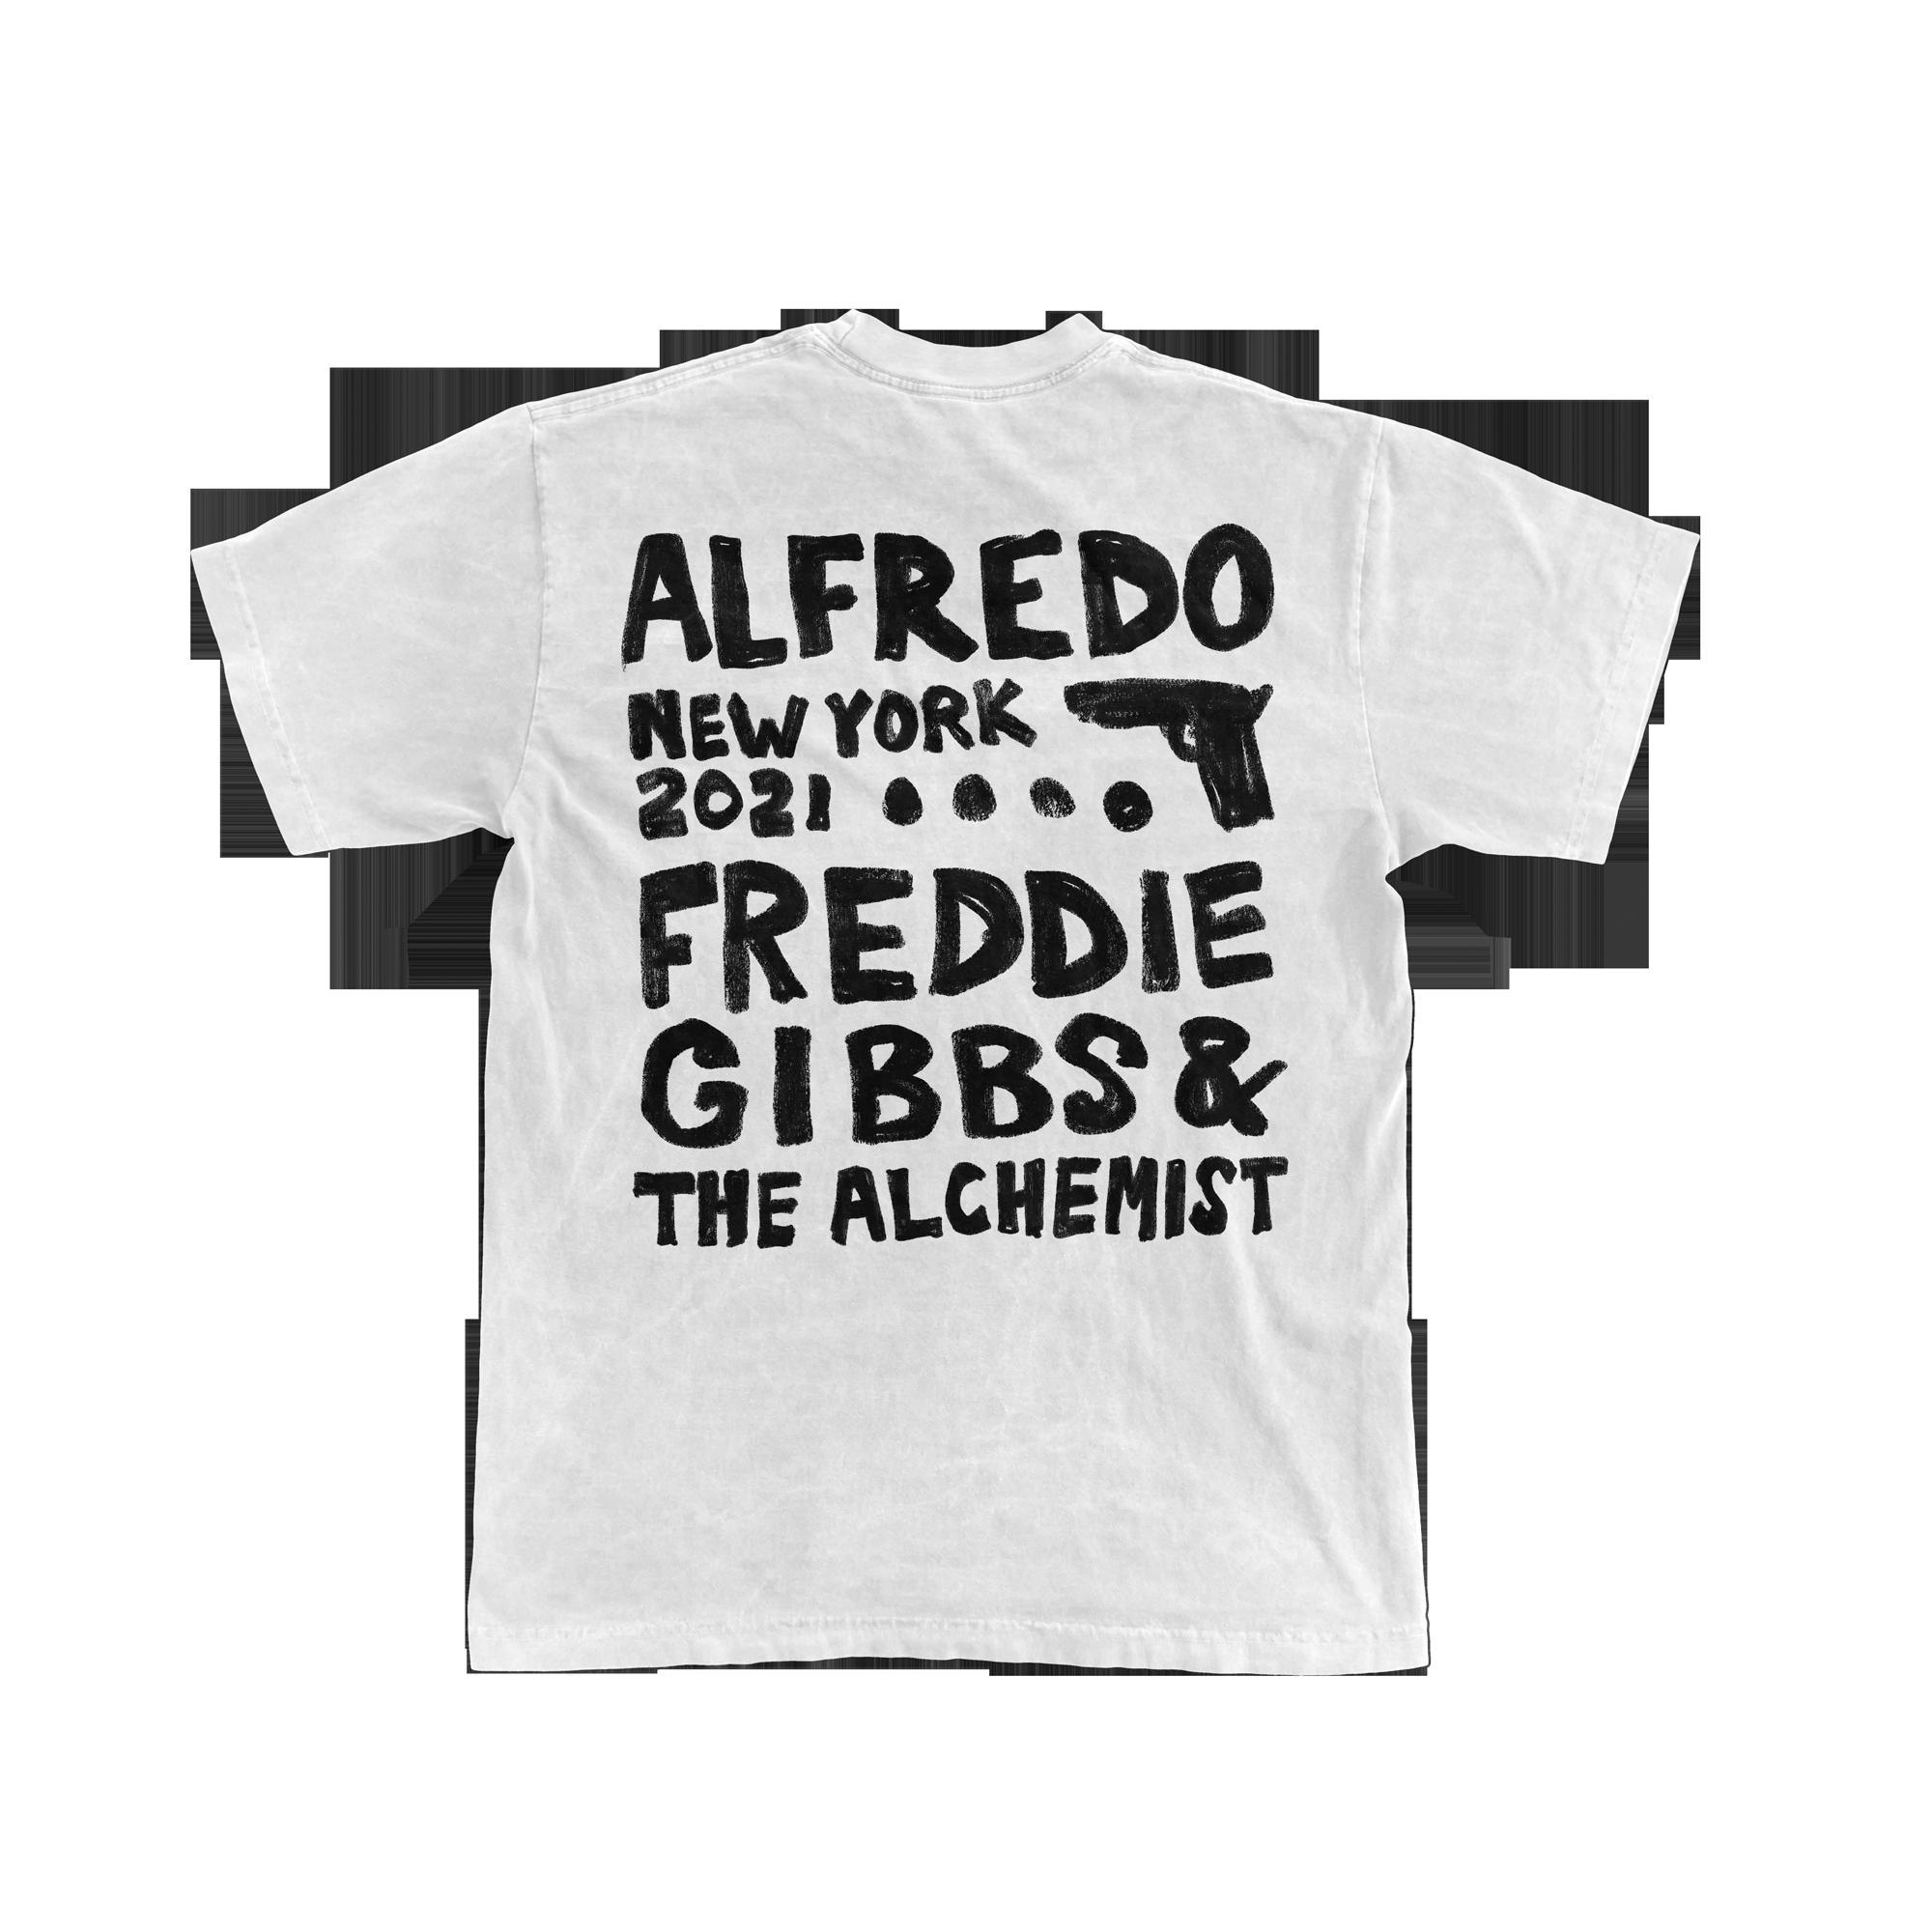 Alfredo's New York Tee